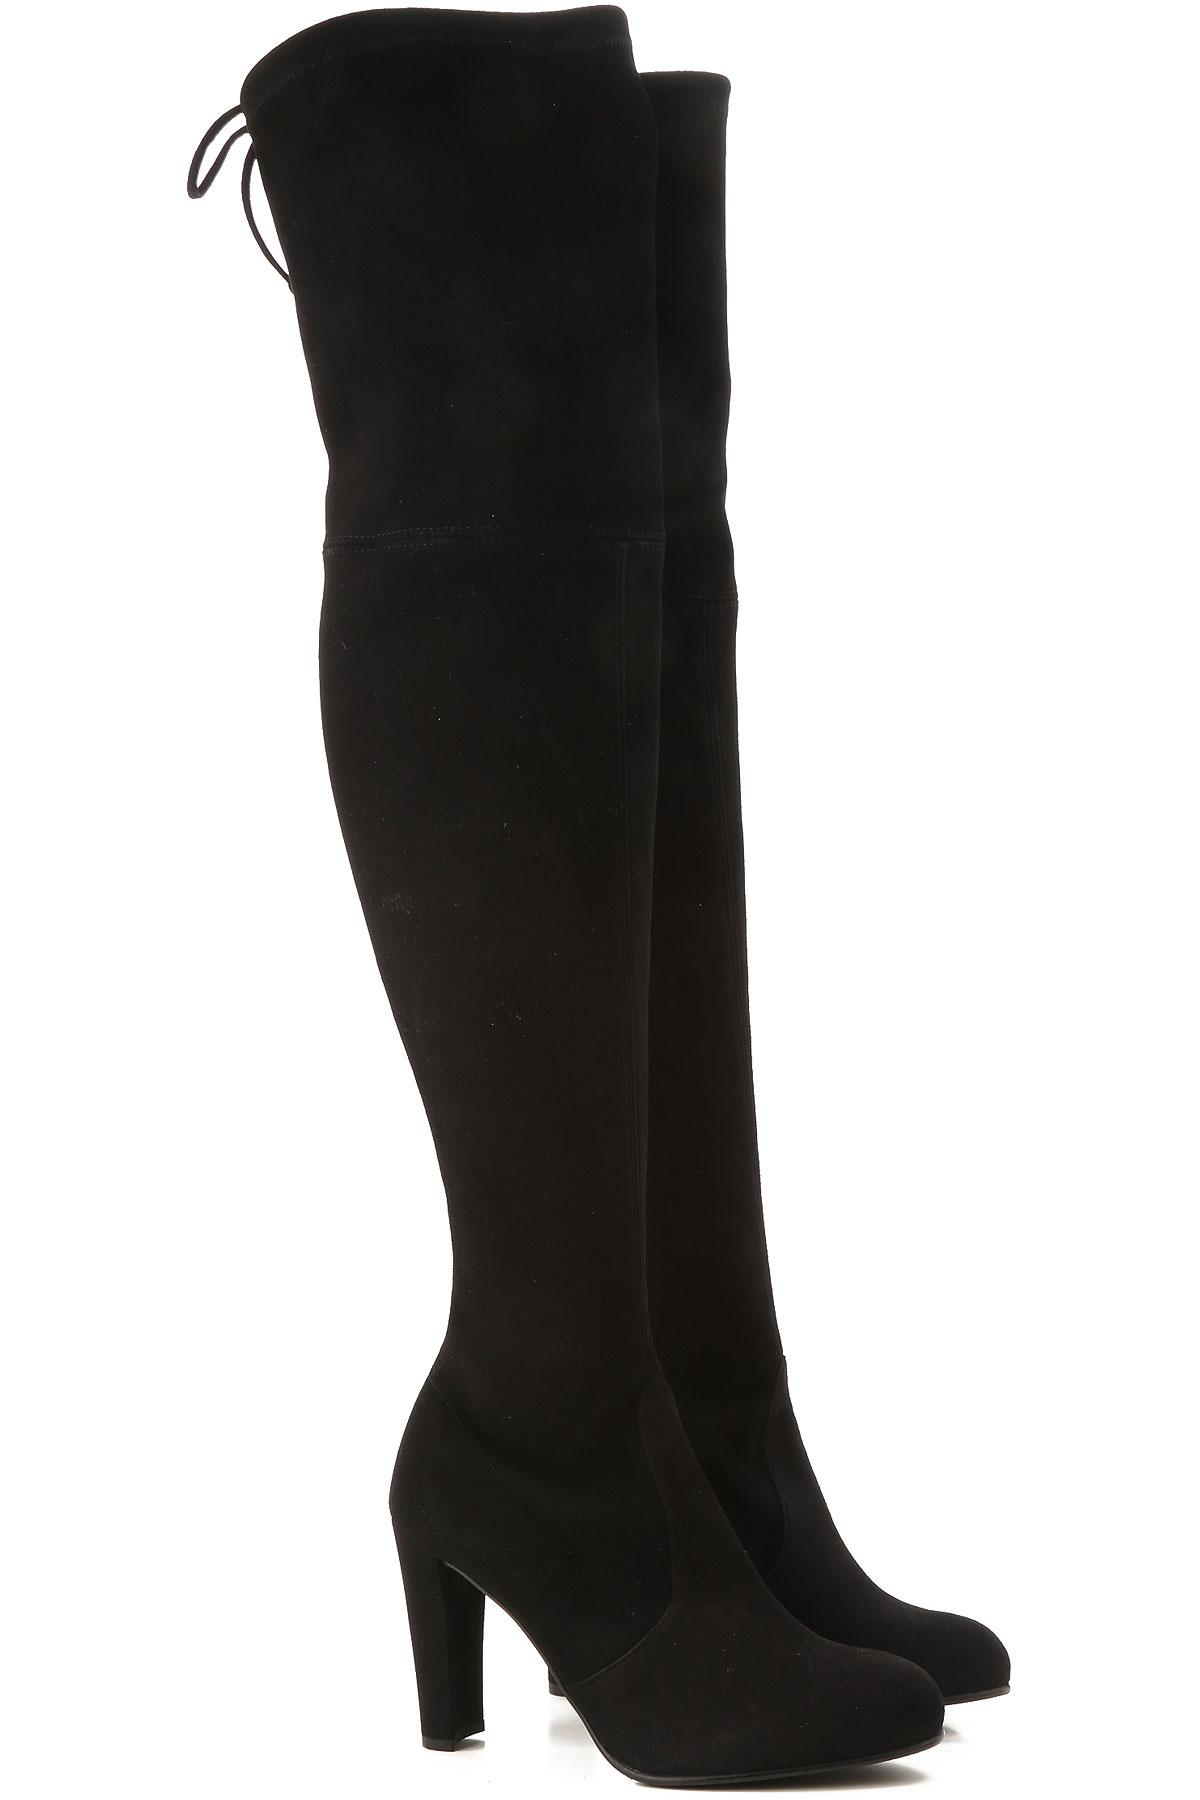 Stuart Weitzman Boots for Women, Booties On Sale, Black, suede, 2019, US 4.5 ( EU 35) US 5 (EU 35.5) US 5.5 (EU 36) US 6 (EU 36.5) US 7.5 (EU 38)